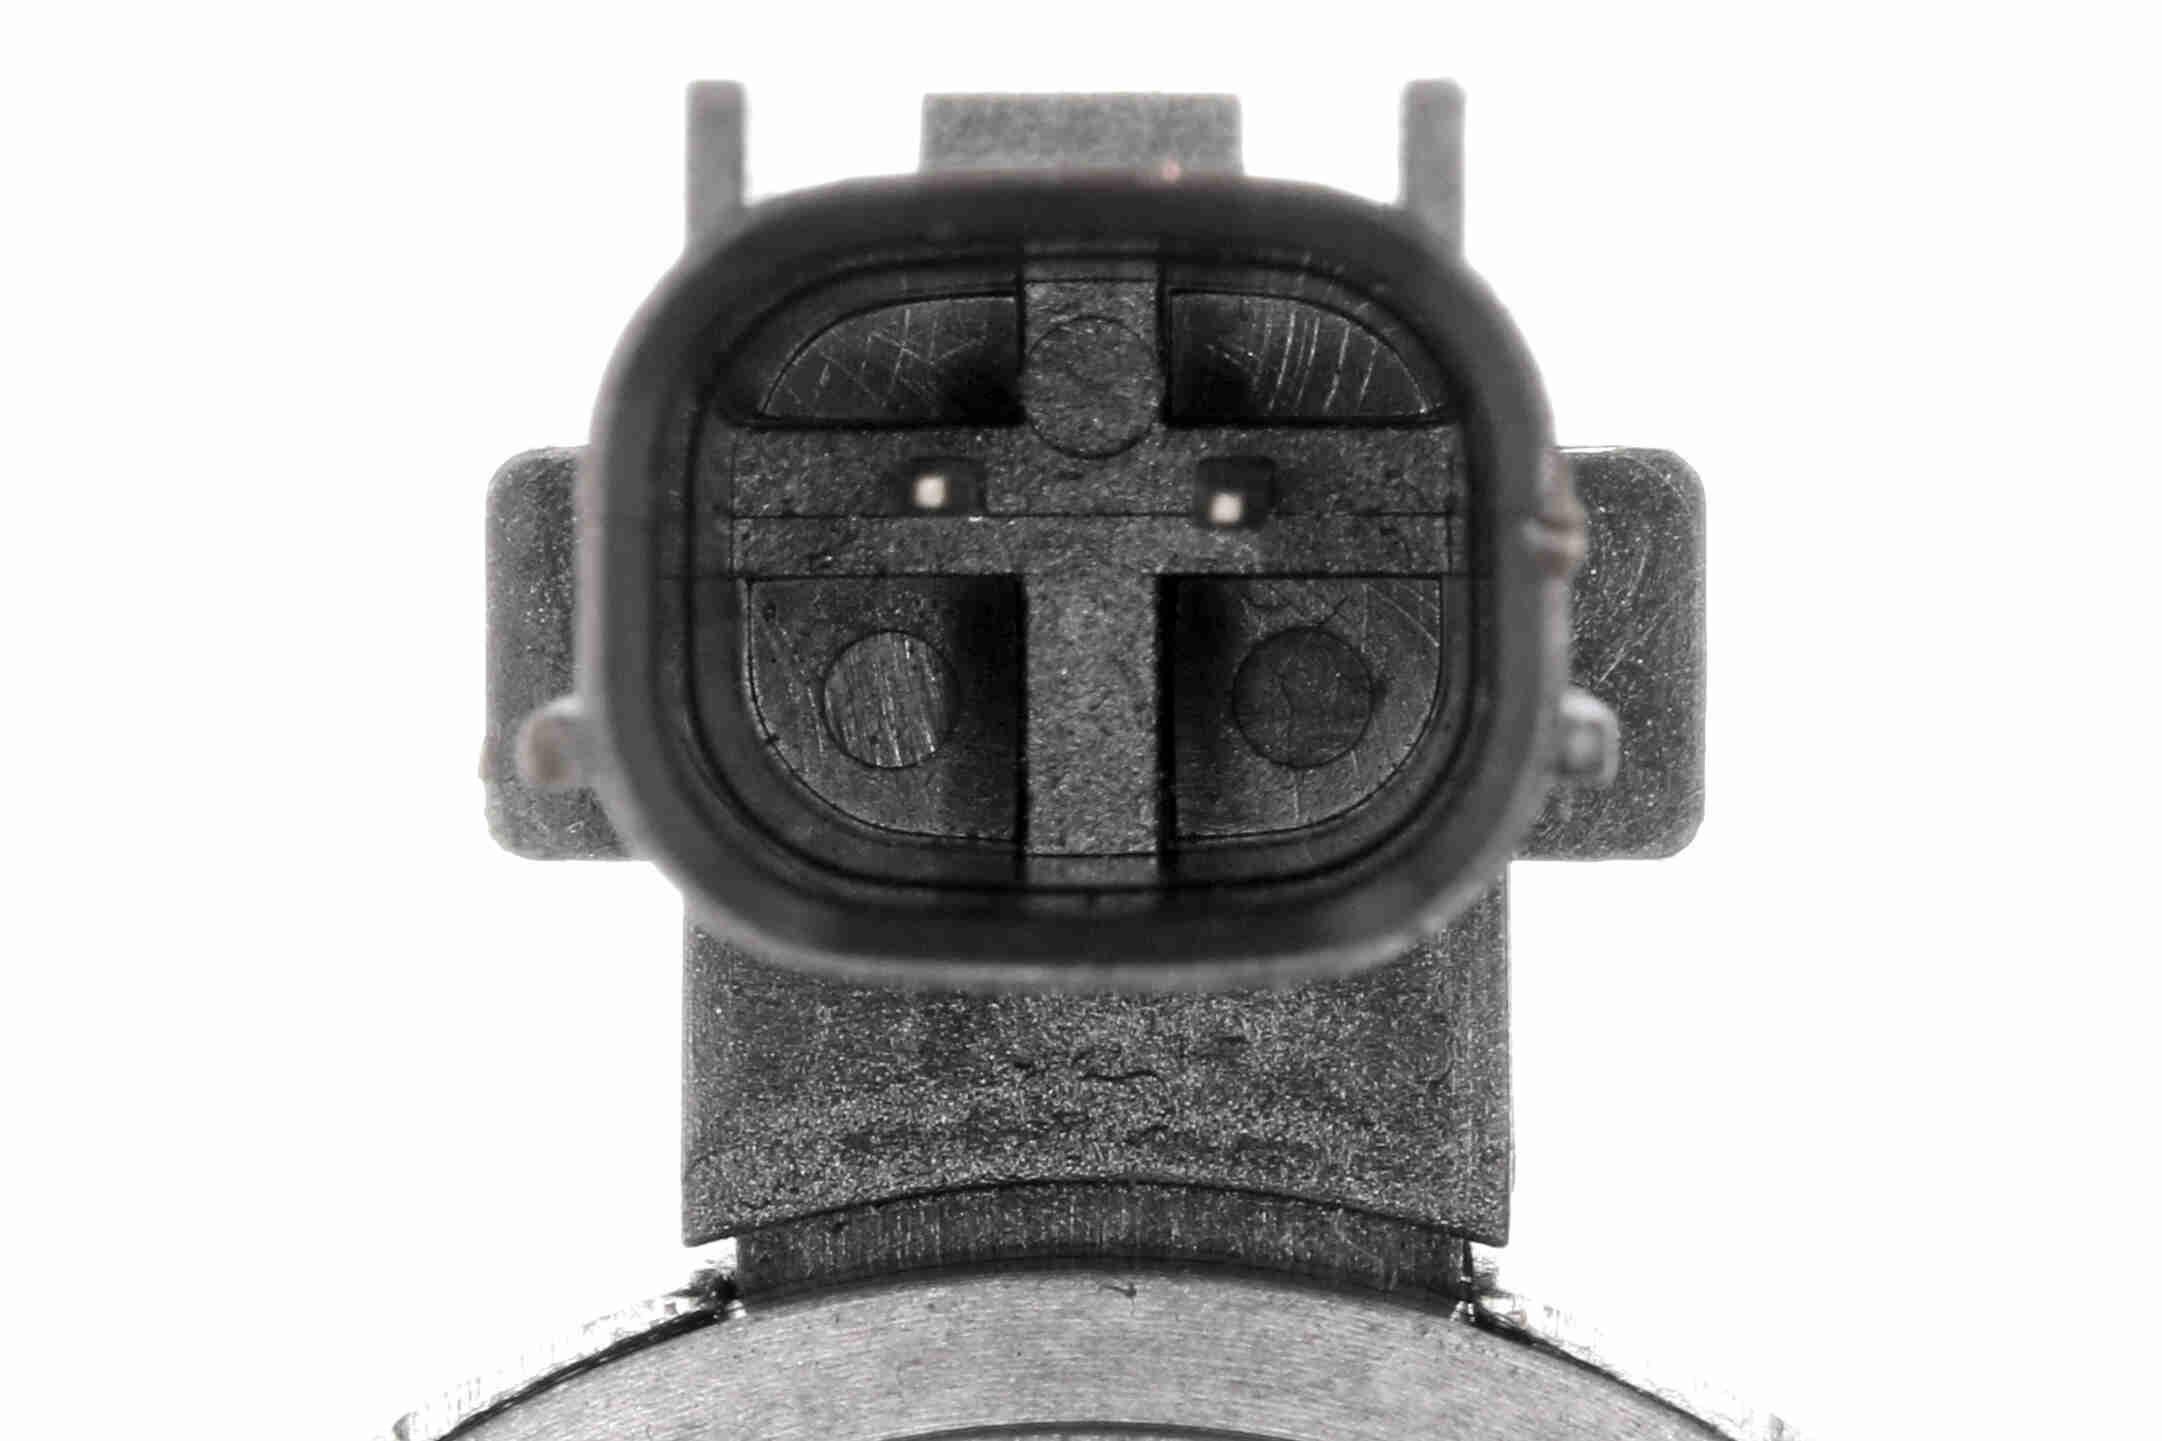 A26770008 Schaltventil, Automatikgetriebe Original ACKOJA Qualität ACKOJA A26-77-0008 - Große Auswahl - stark reduziert